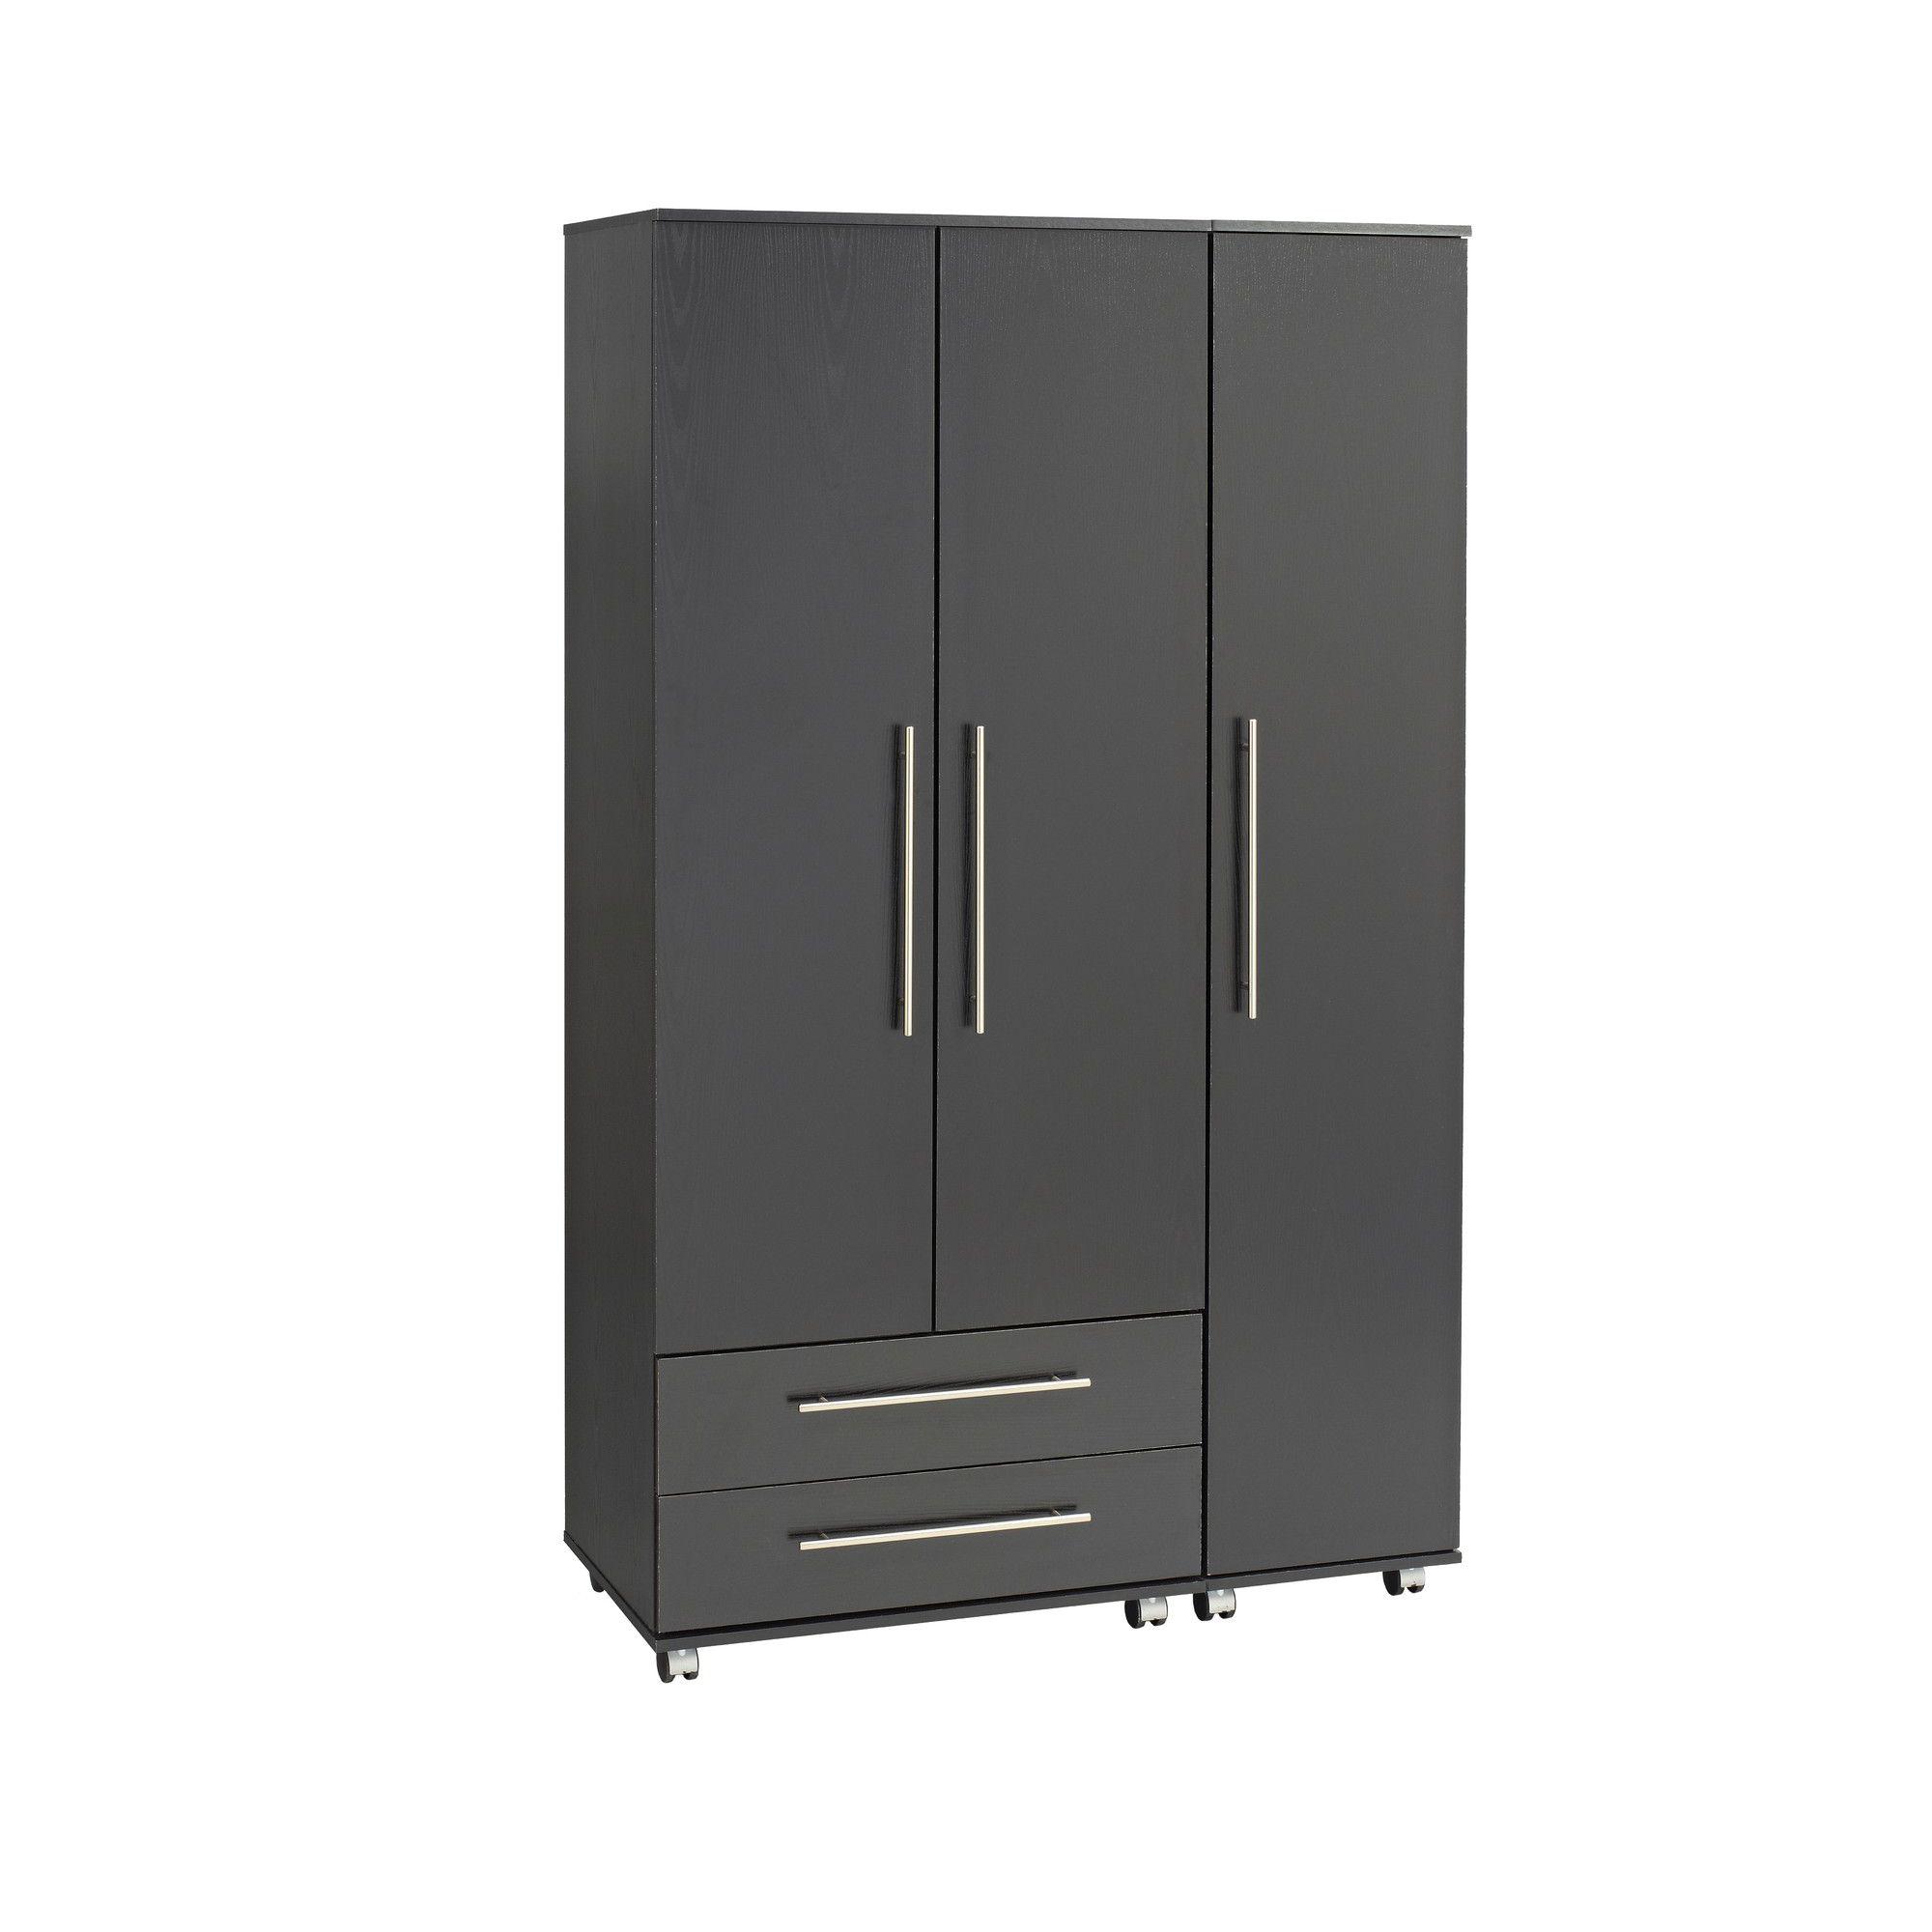 Ideal Furniture Bobby 3 Door Wardrobe - Walnut at Tesco Direct